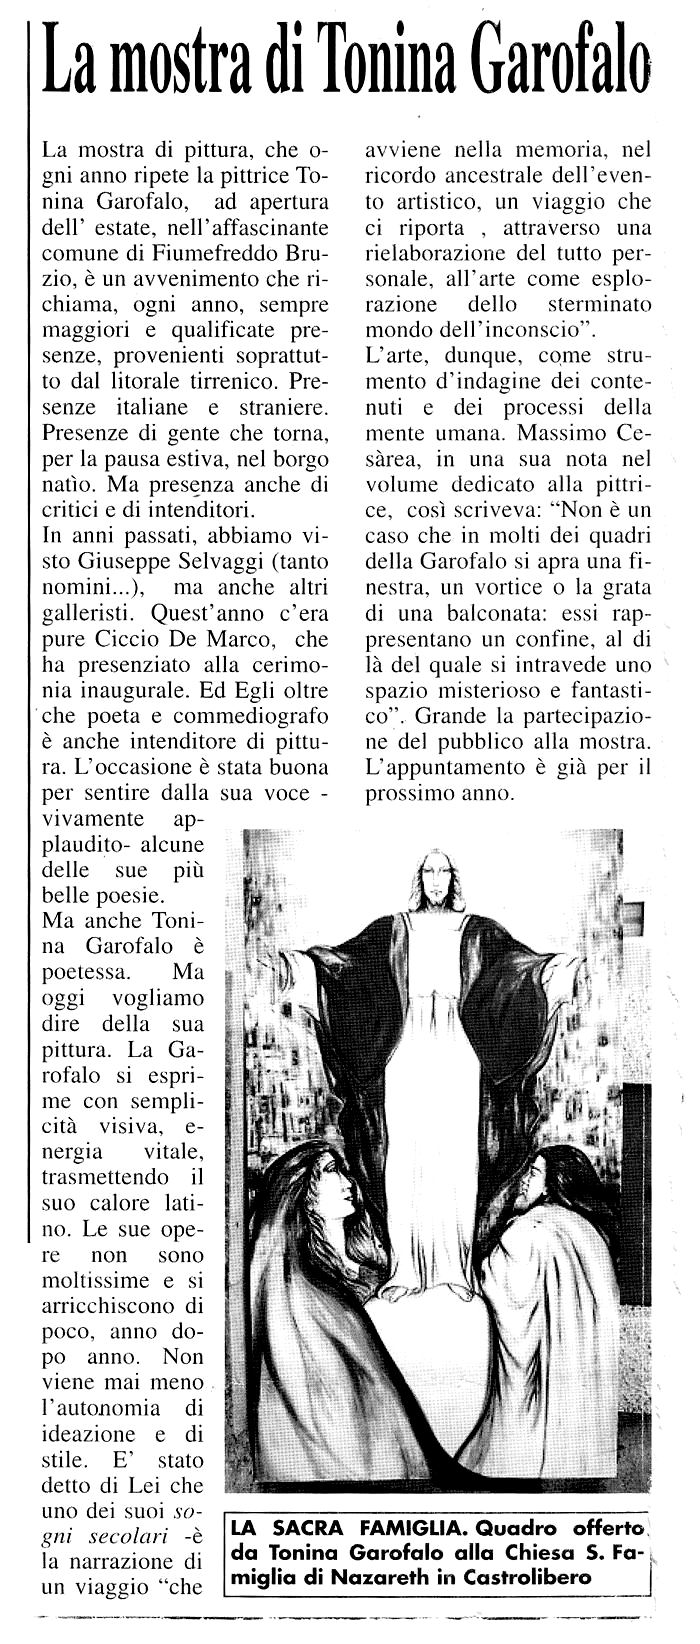 https://www.toninagarofalo.it/old/res/Rassegnastampa/iniziativaagostosettembre98.jpg